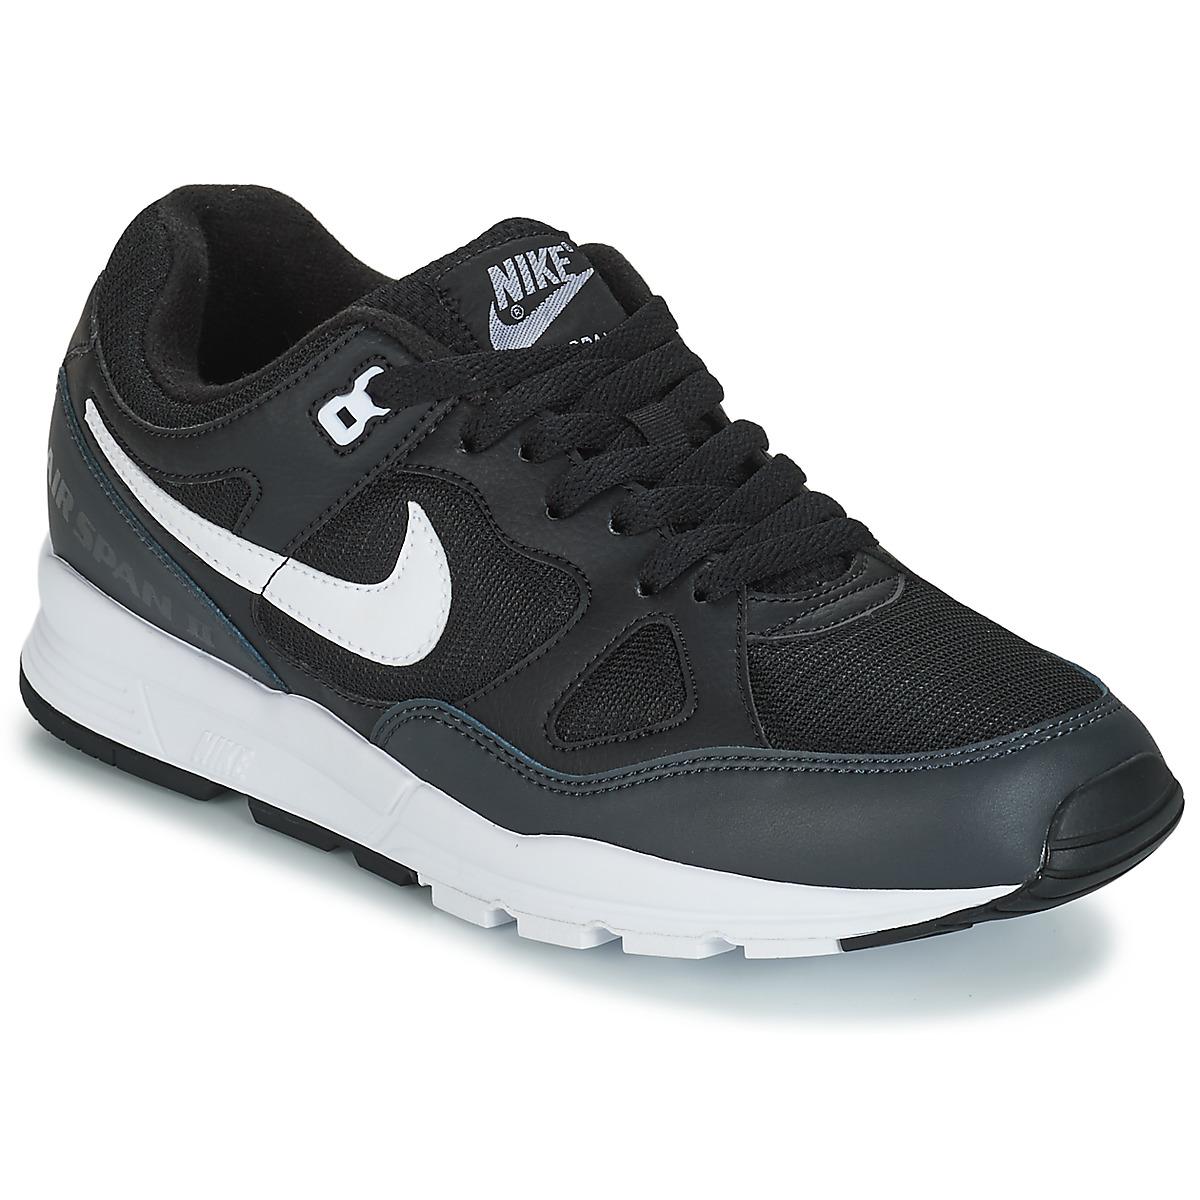 19fa002a6c7 Nike Niske tenisice AIR SPAN II Crna - Jeftinije.hr